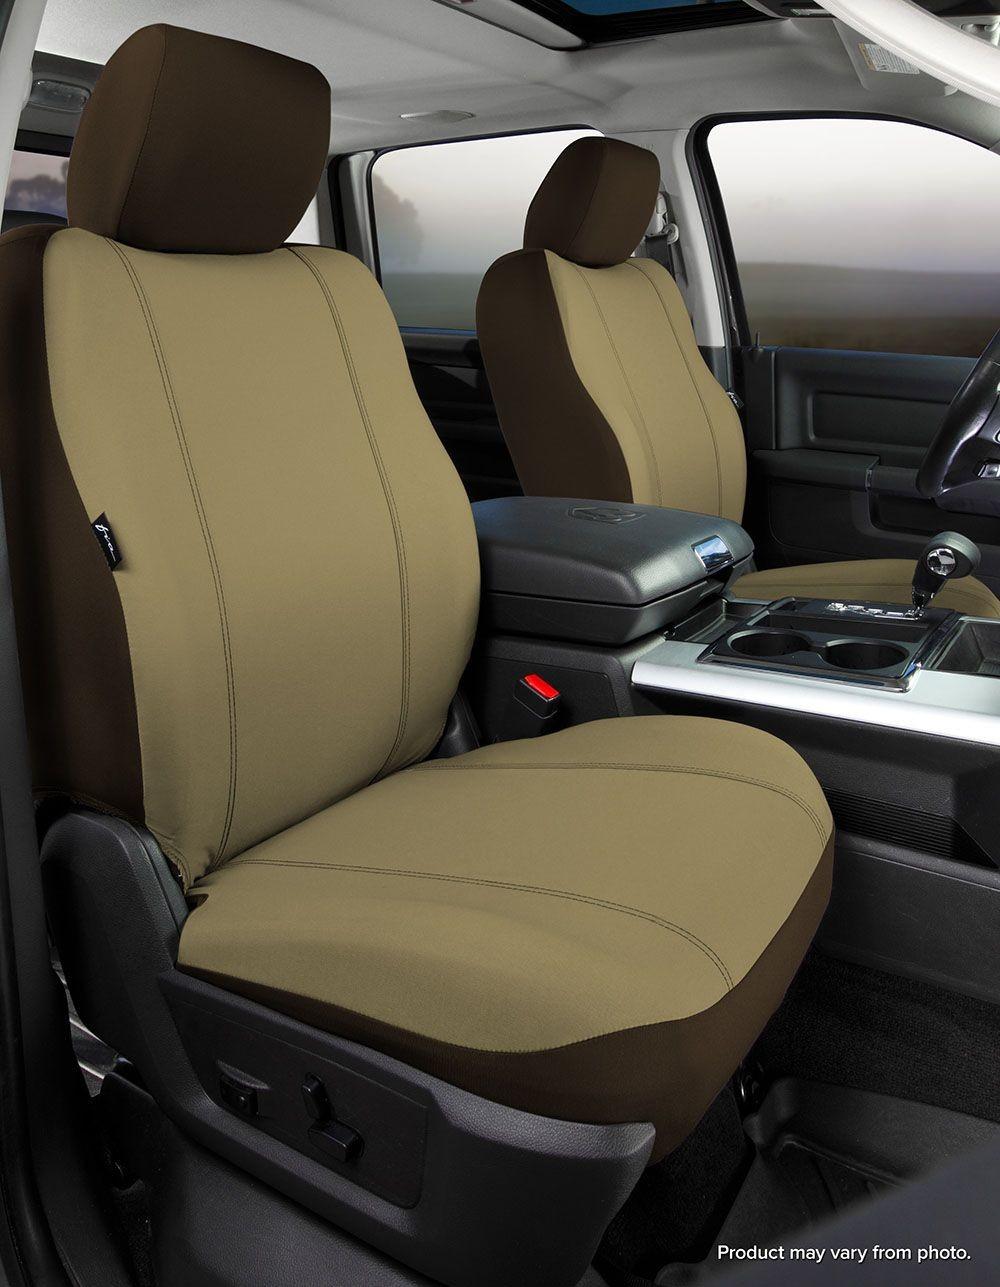 Imagen de Cubierta de asiento para Nissan Frontier 2012 Marca FIA Número de Parte SP89-53 TAUPE